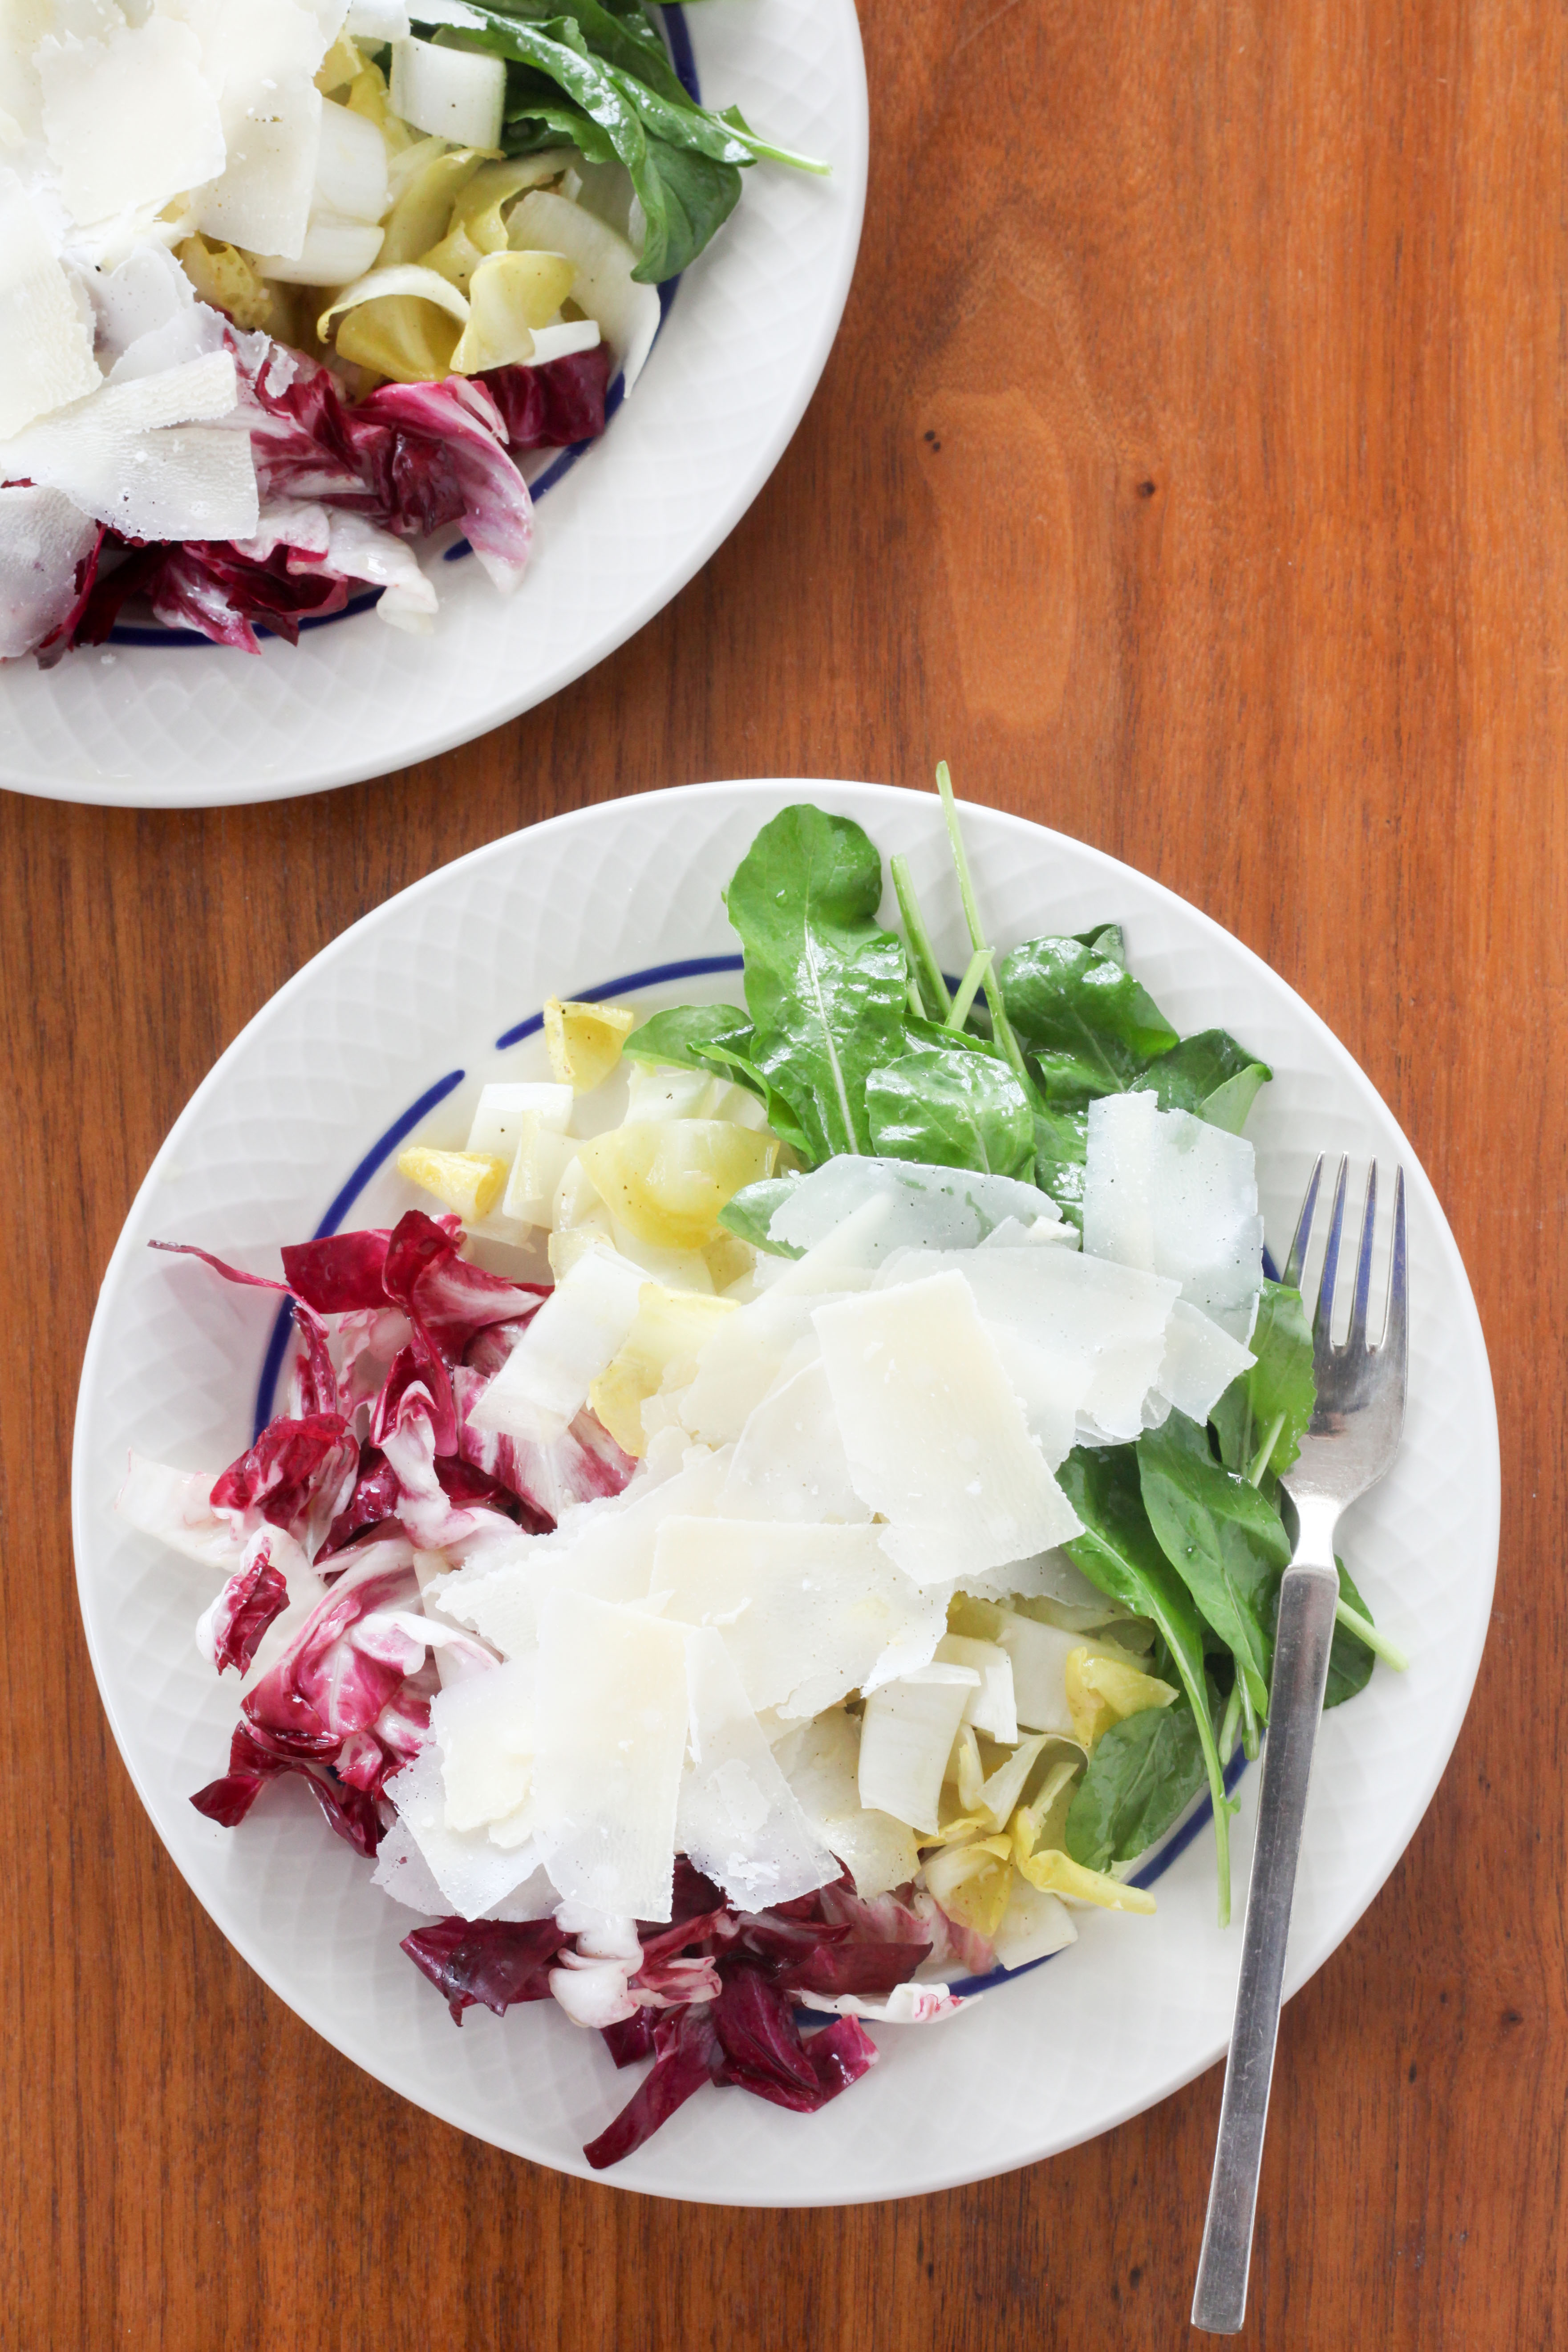 Tricolore Salad (Radicchio, Endive, and Arugula) | amodestfeast.com | @amodestfeast